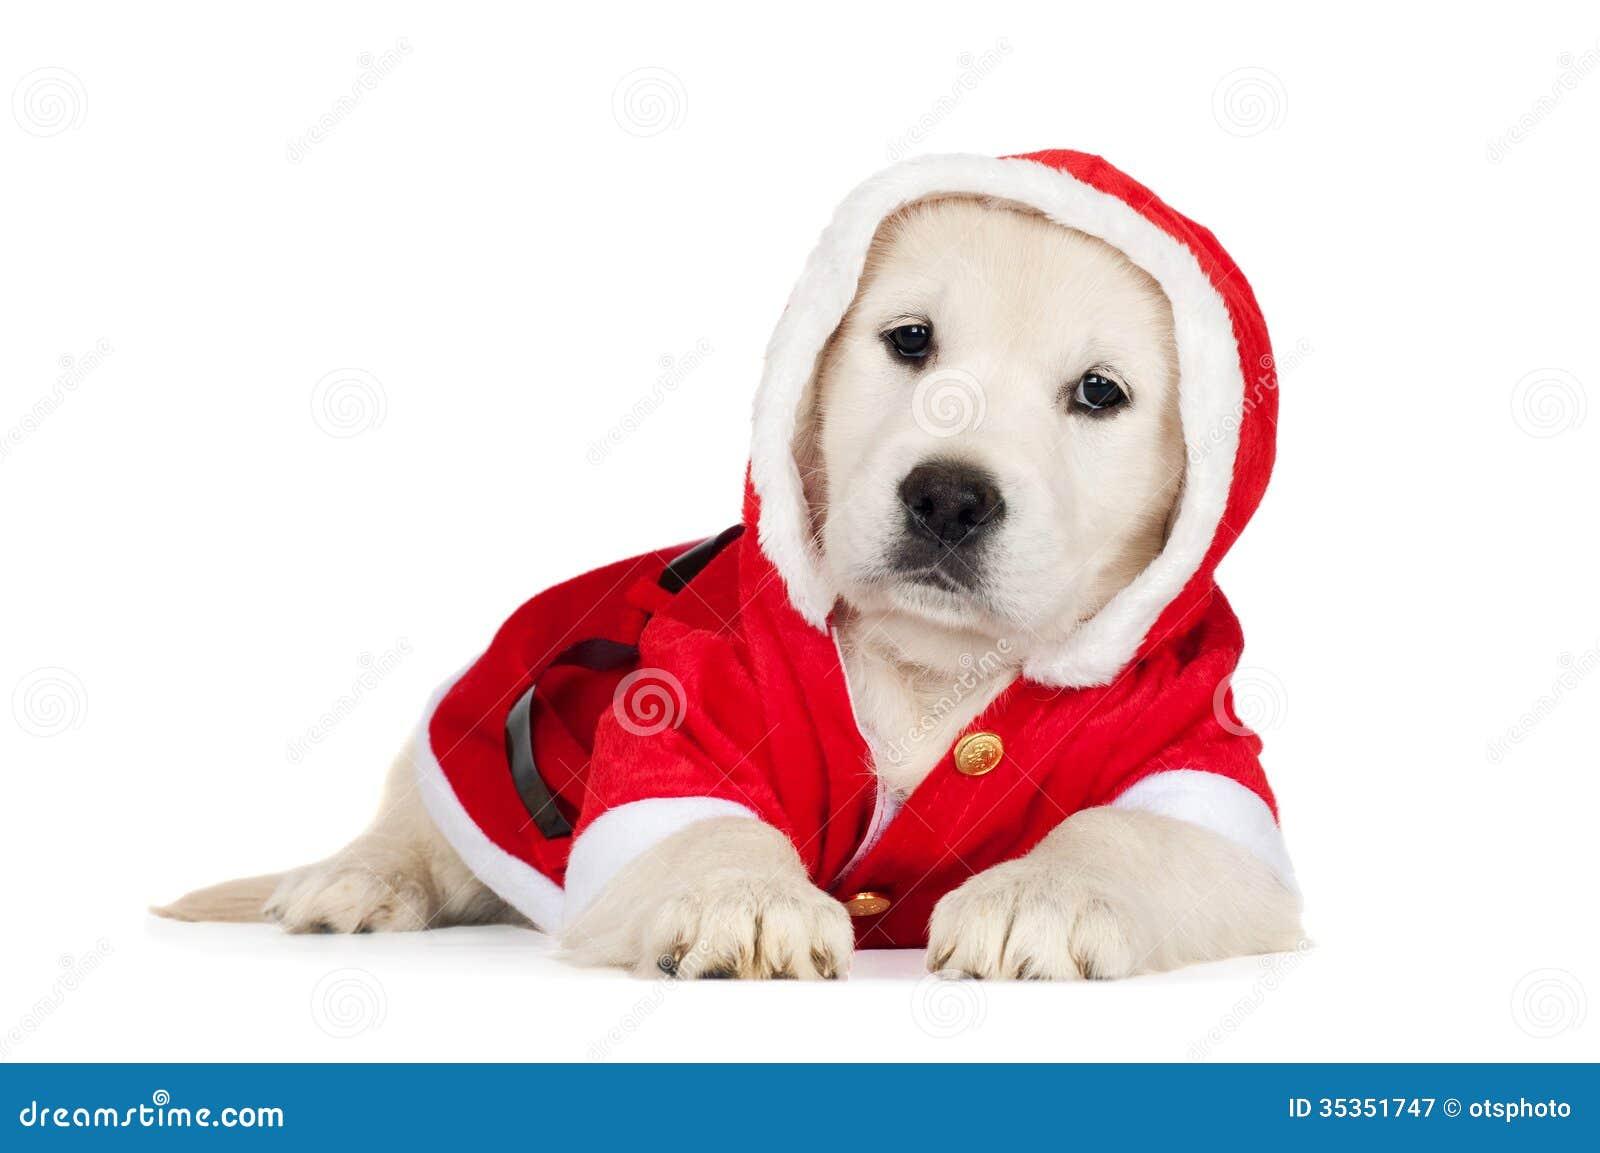 Golden Retriever Puppy In A Santa Costume Stock Image Image Of Retriever Labrador 35351747